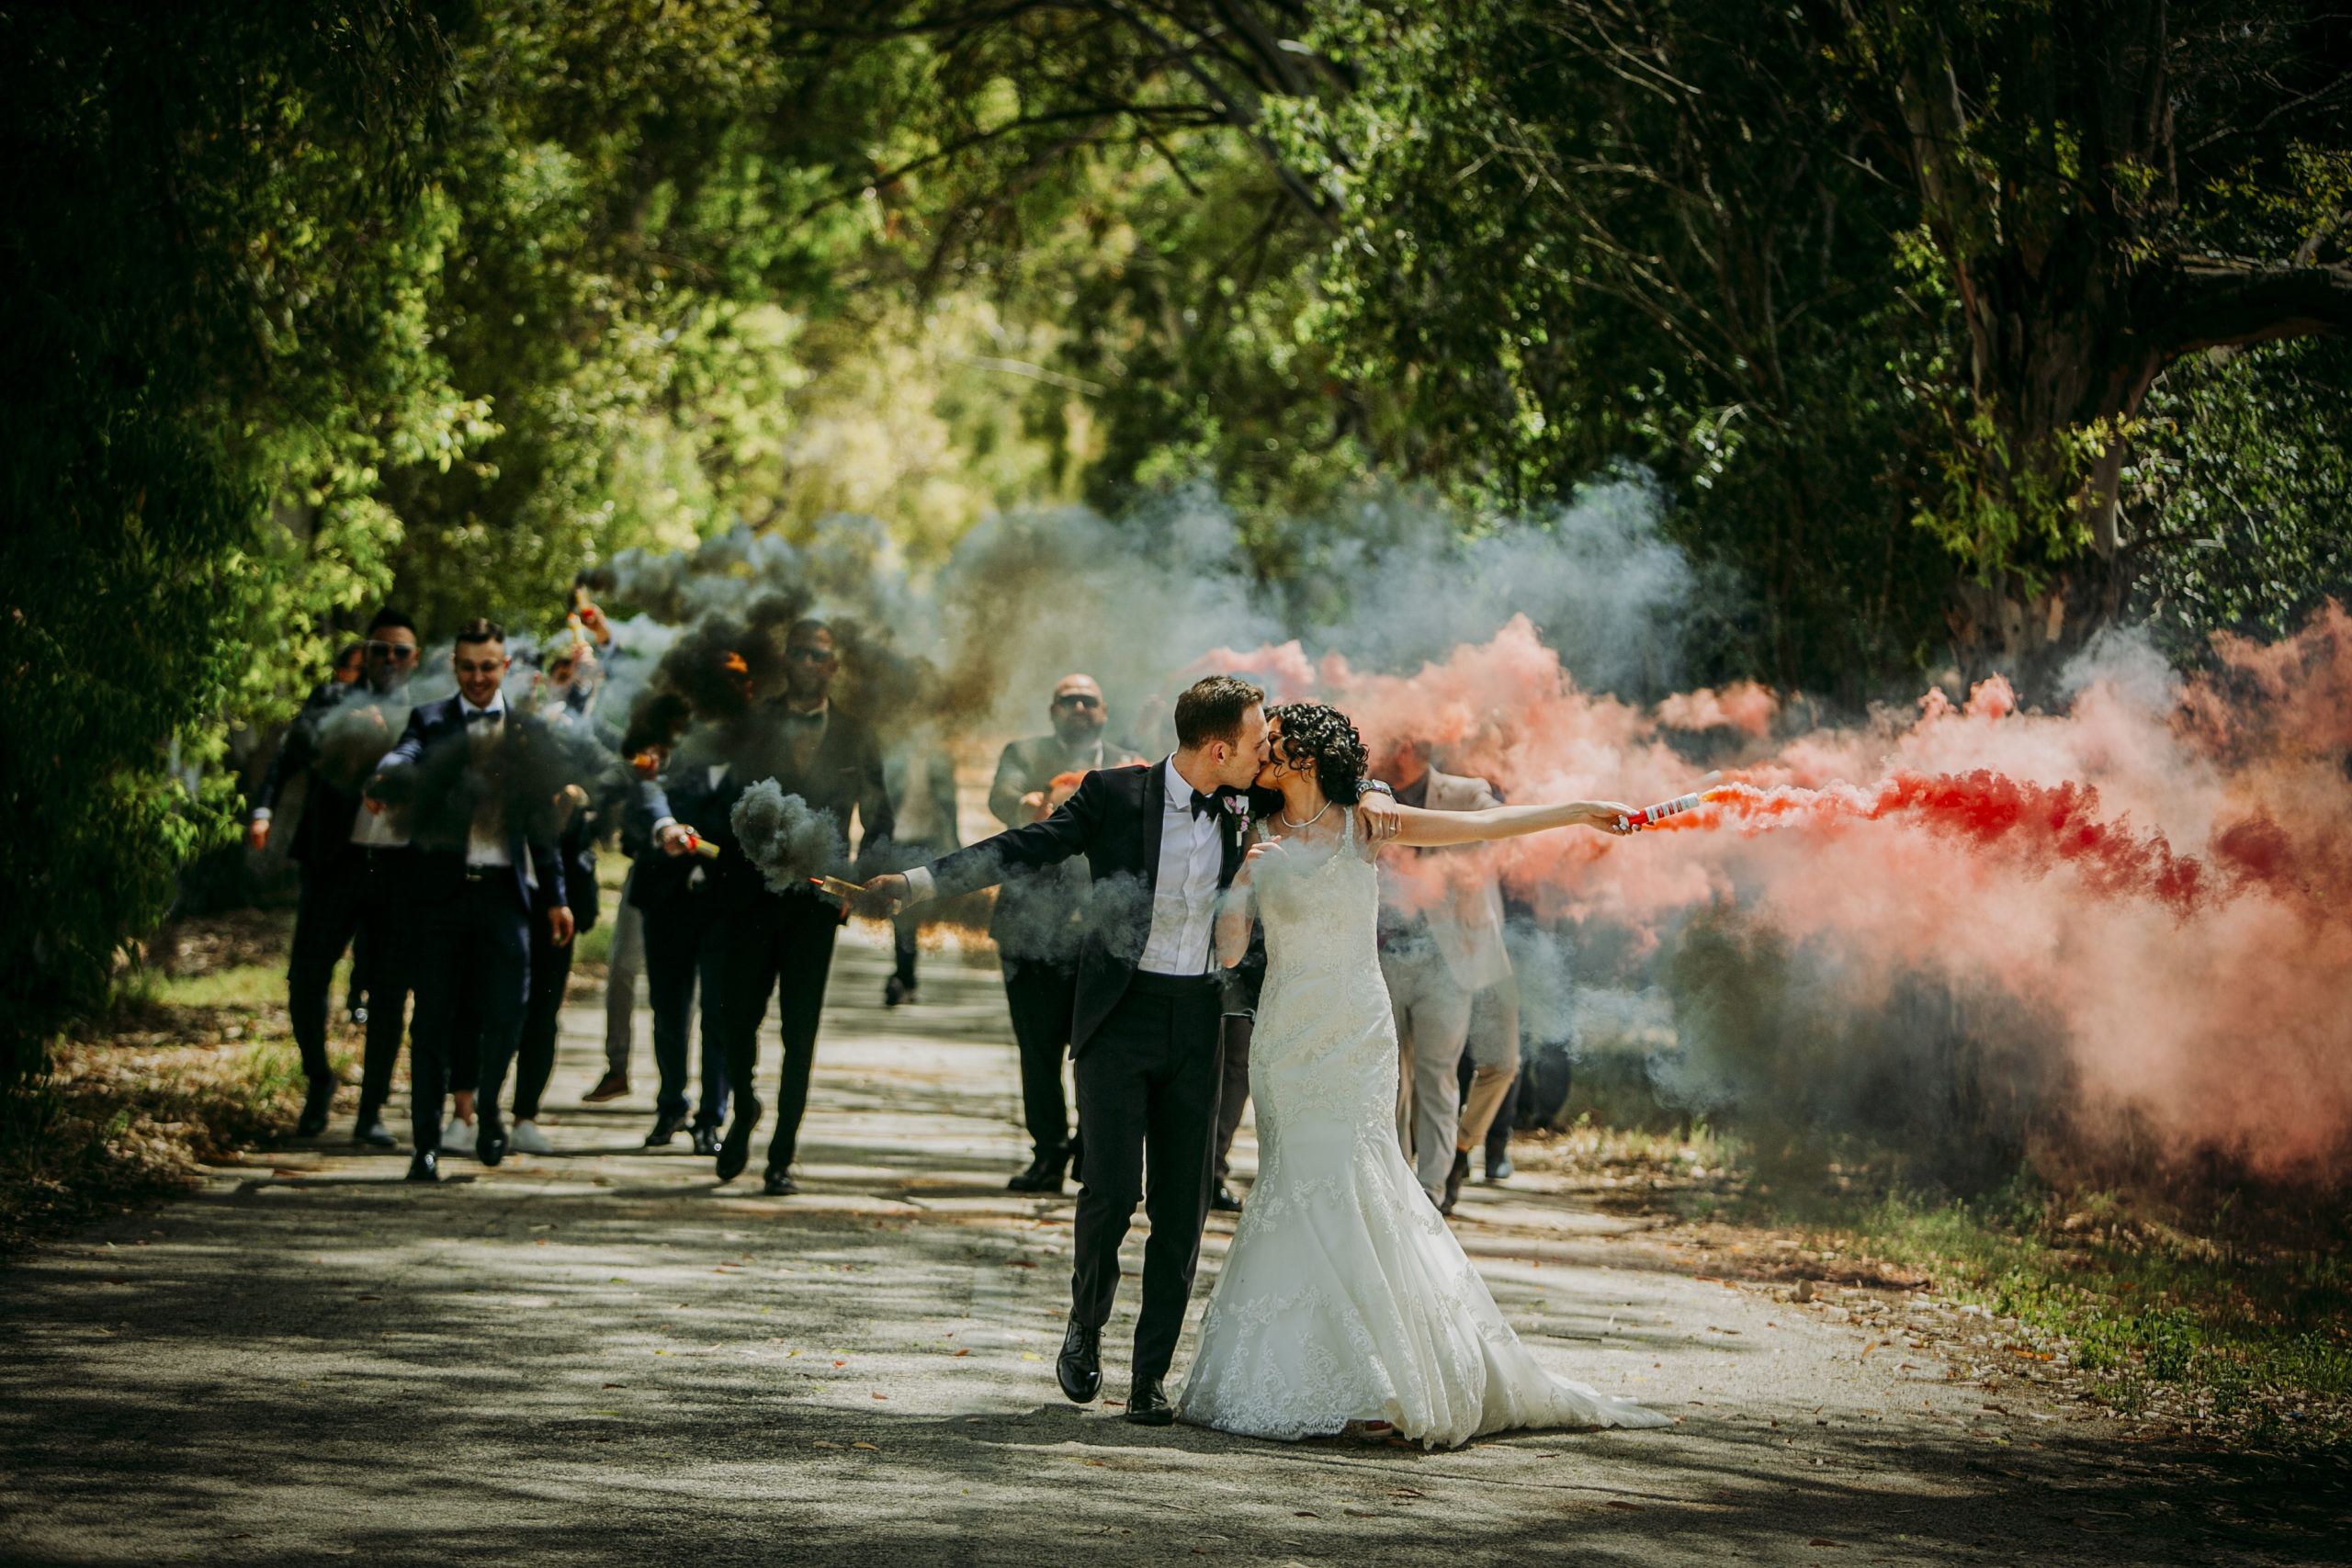 Fotografo matrimoni Foggia sposo sposa fumogeni